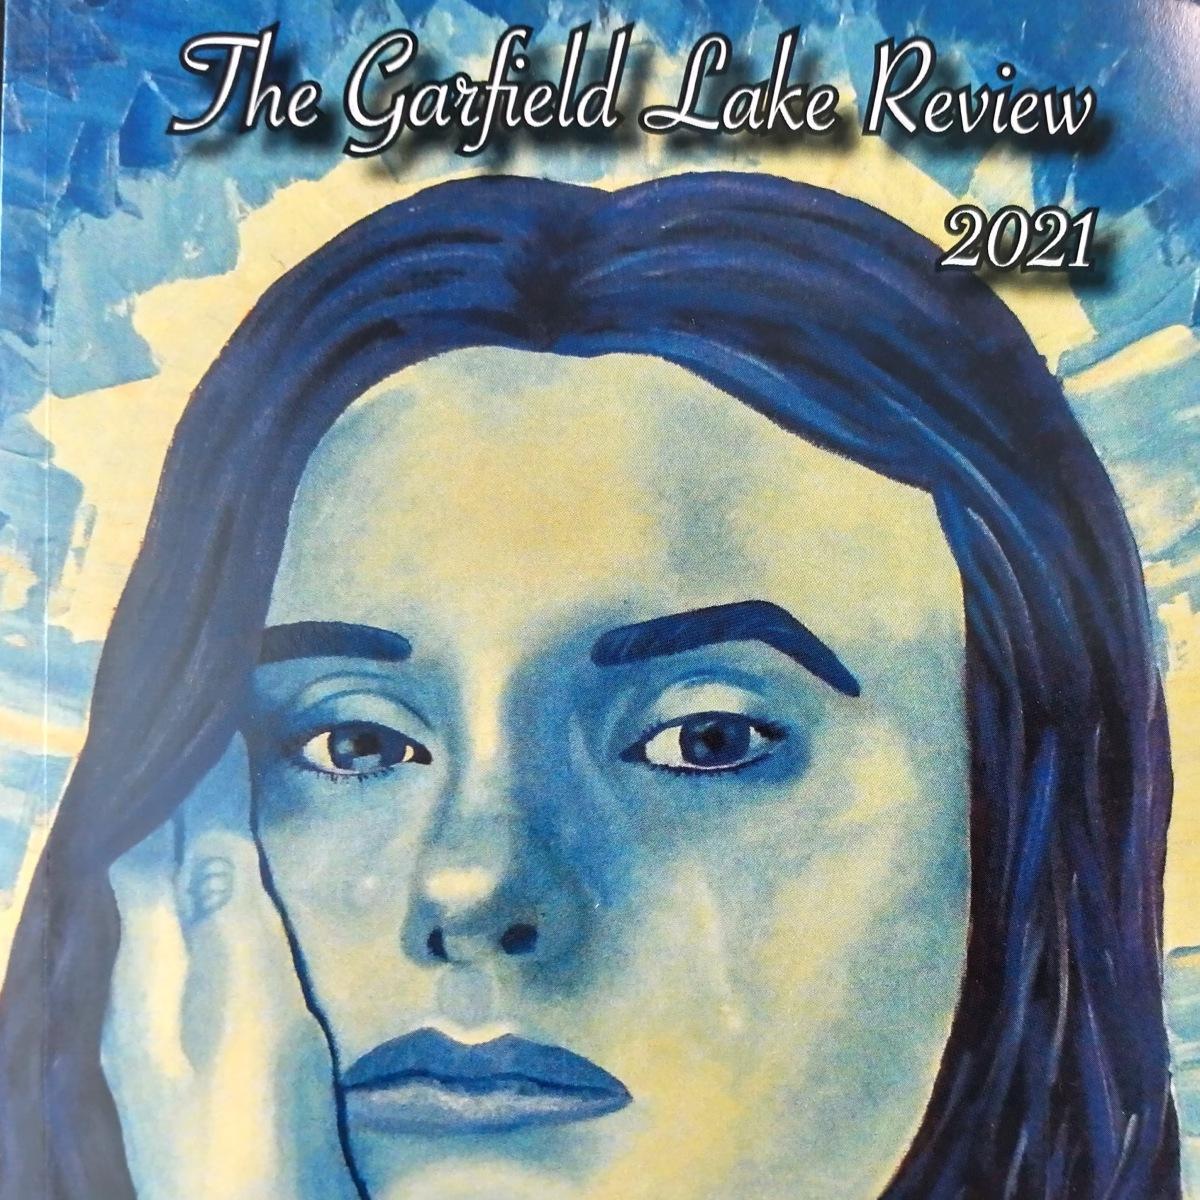 garfield-lake-review-magazine-cover-artist-abby-Licht-author-abigail-e-sims